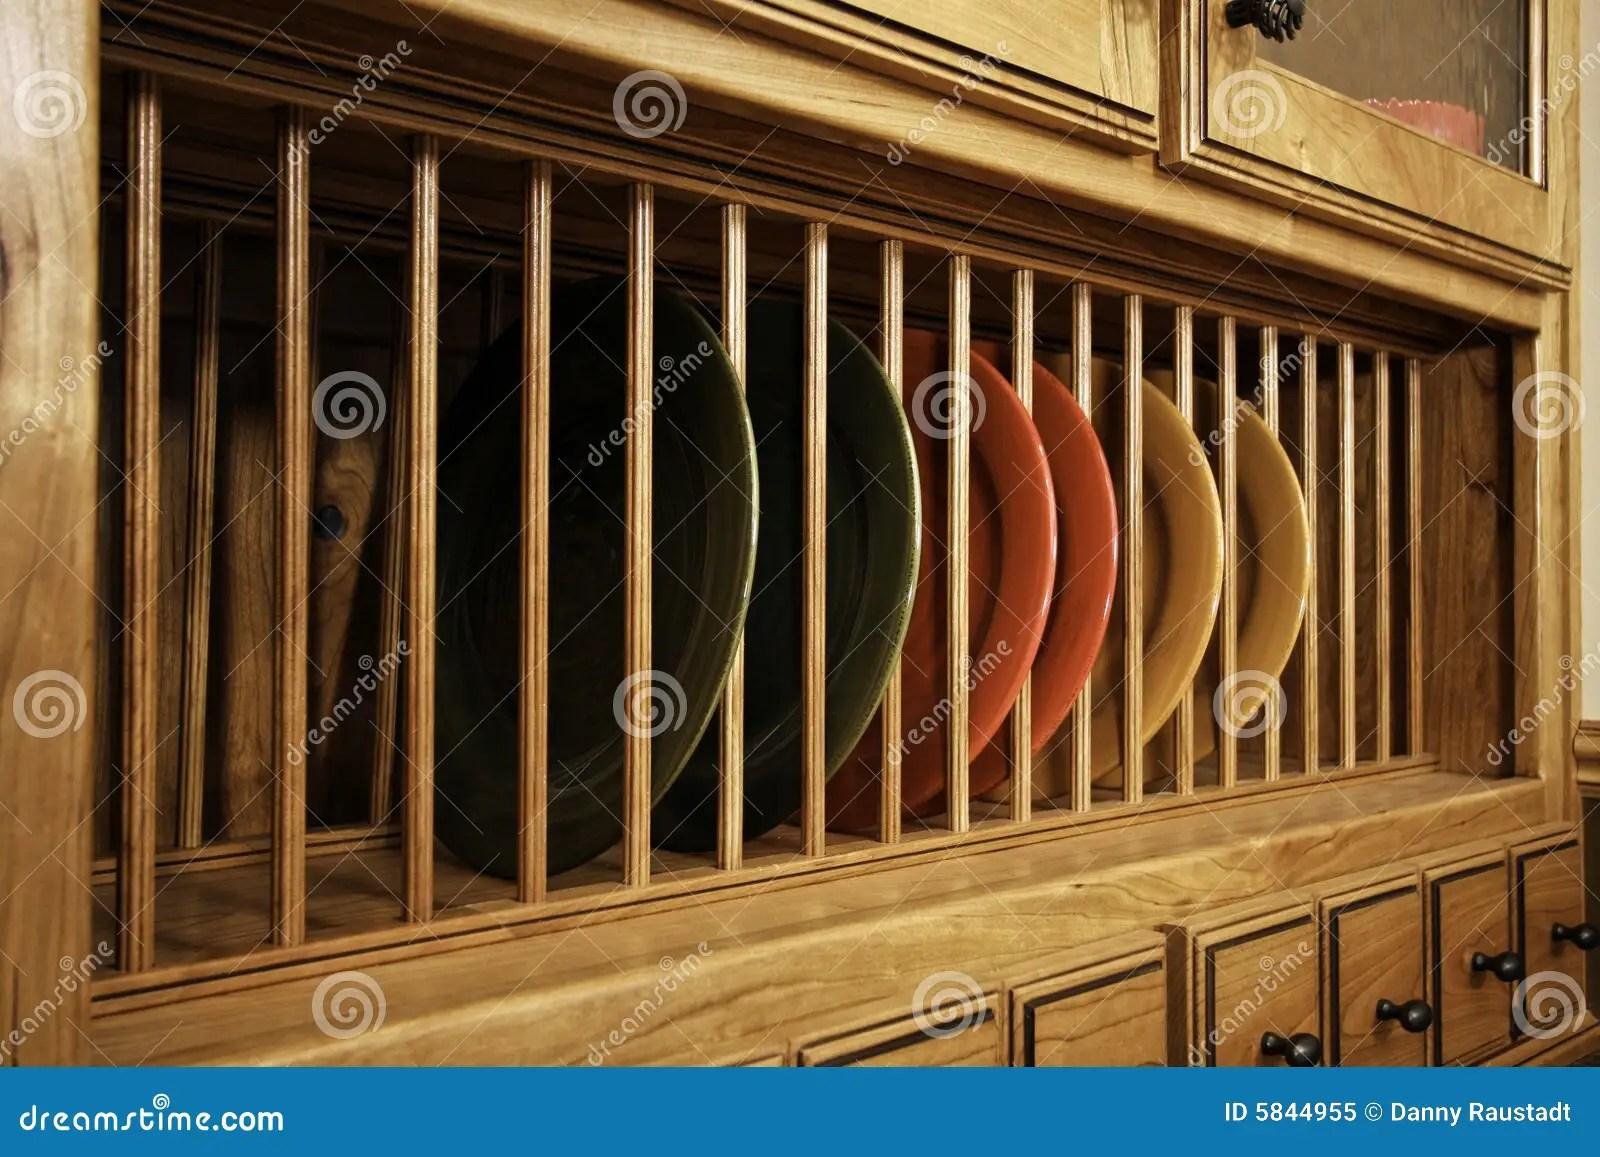 Unique Kitchen Cabinet Dish Storage Stock Image  Image of